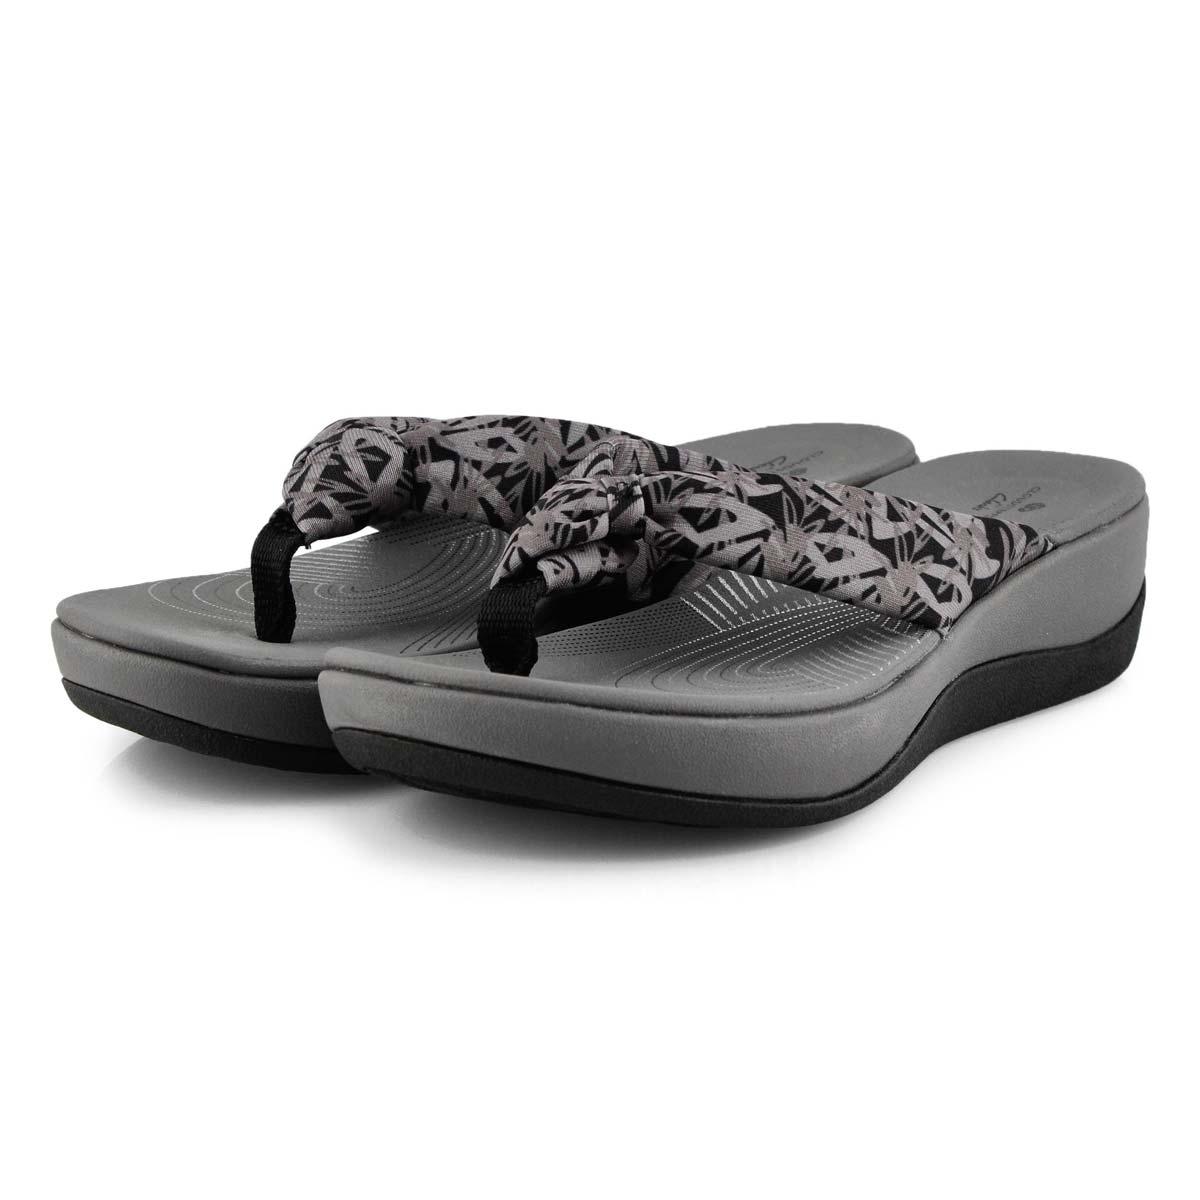 Women's Arla Glison Thong Wedge Sandal - Flor Blk